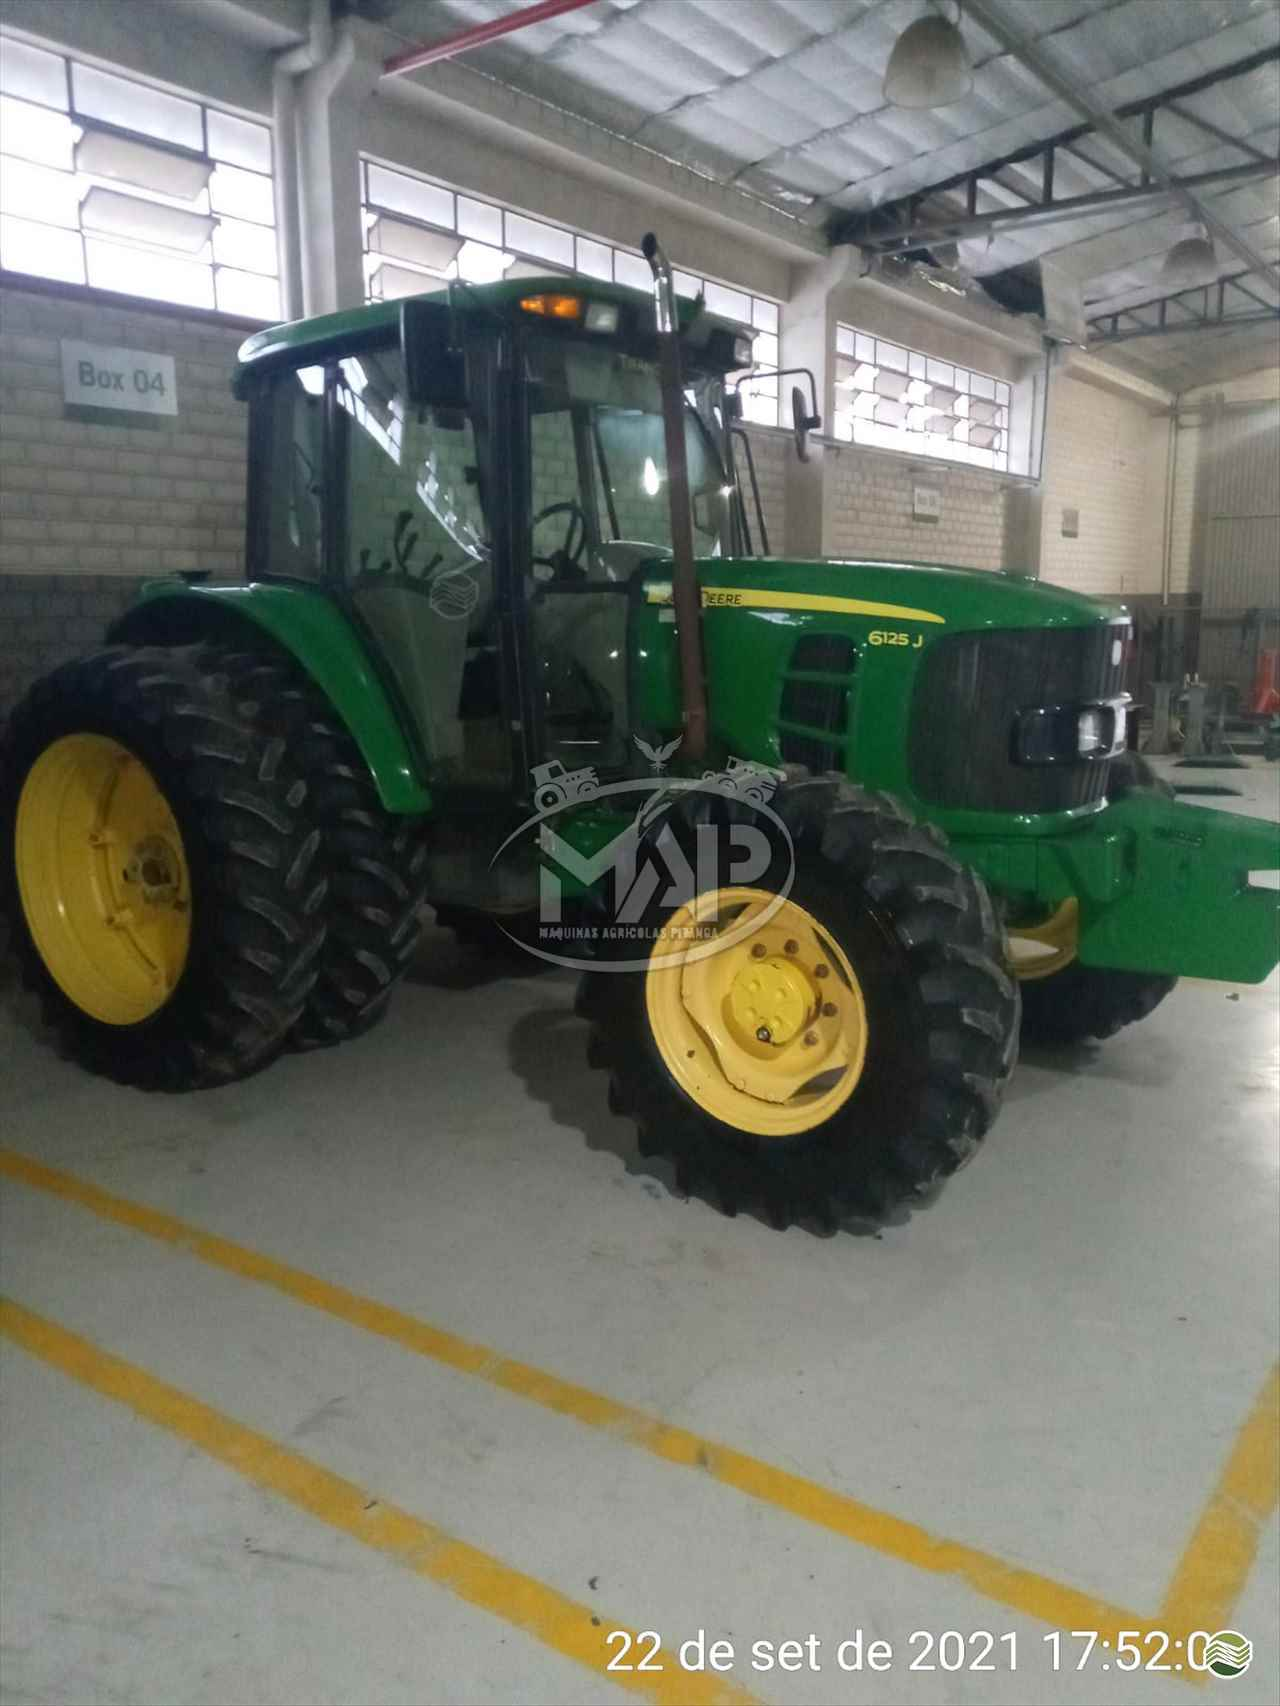 TRATOR JOHN DEERE JOHN DEERE 6125 Tração 4x4 Máquinas Agrícolas Pitanga PITANGA PARANÁ PR